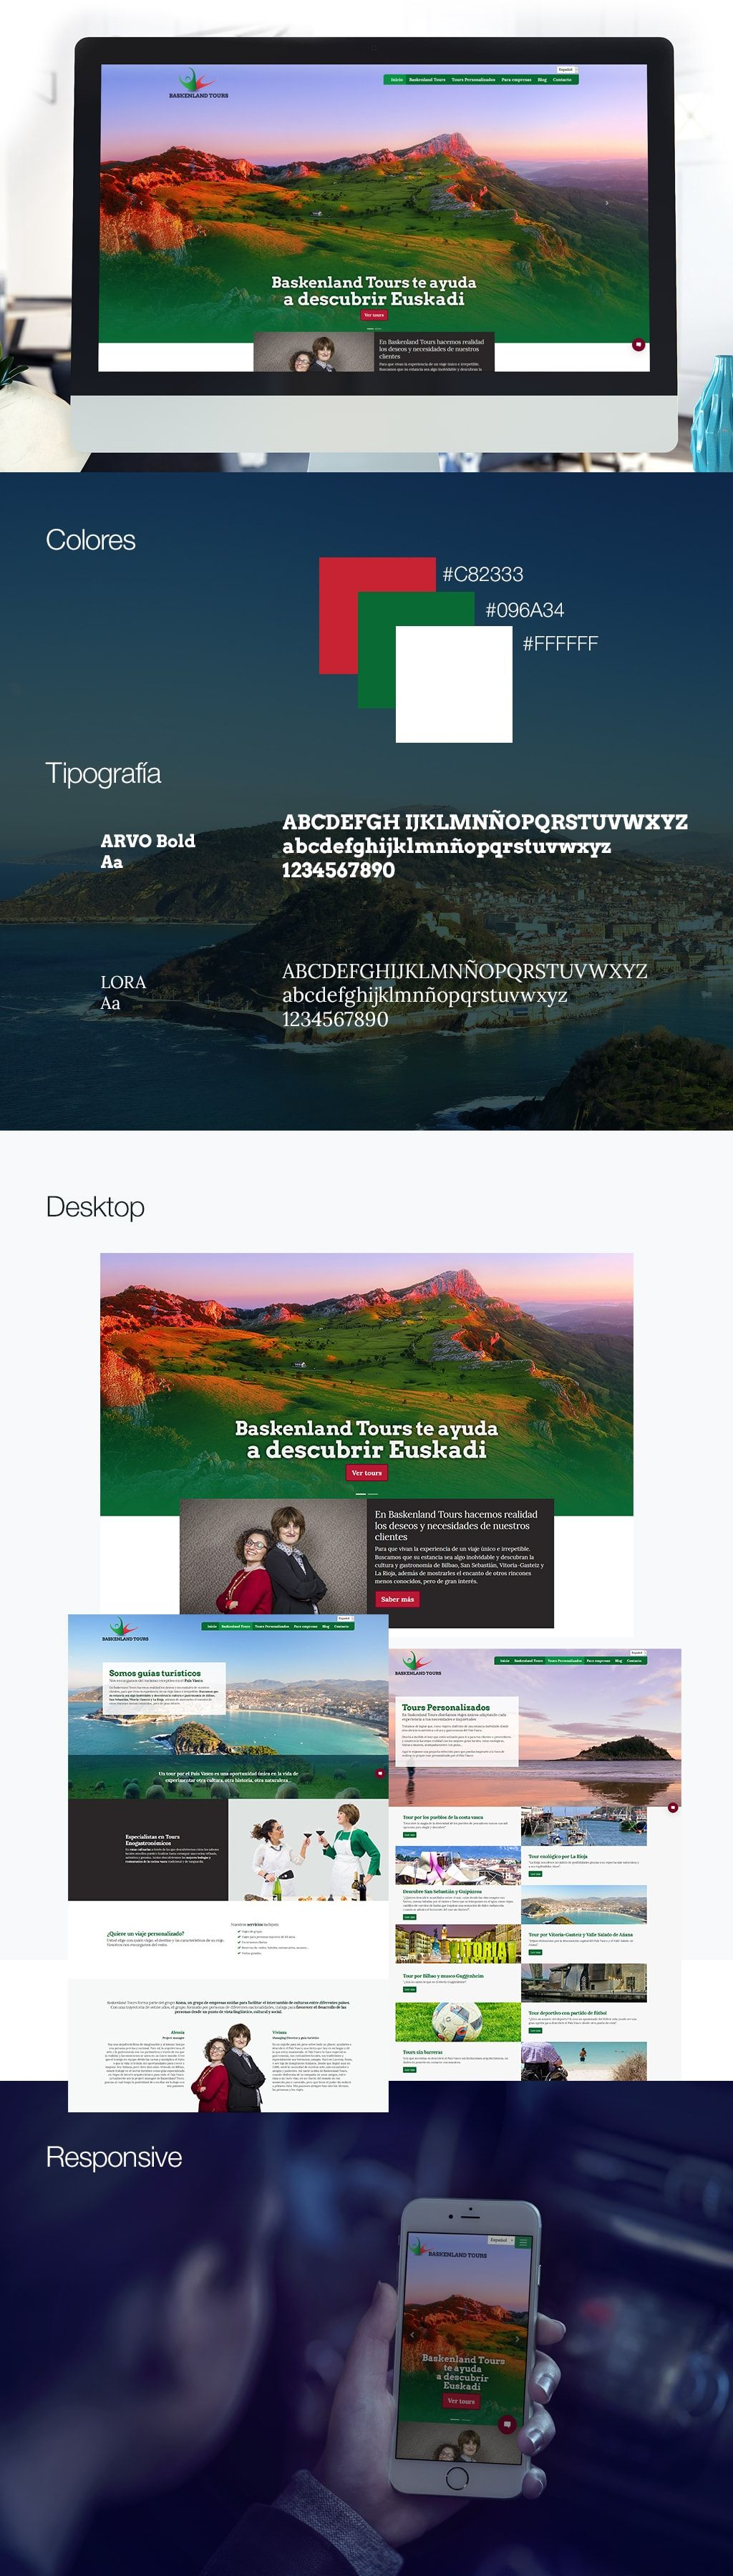 Baskenland Tours Diseño web